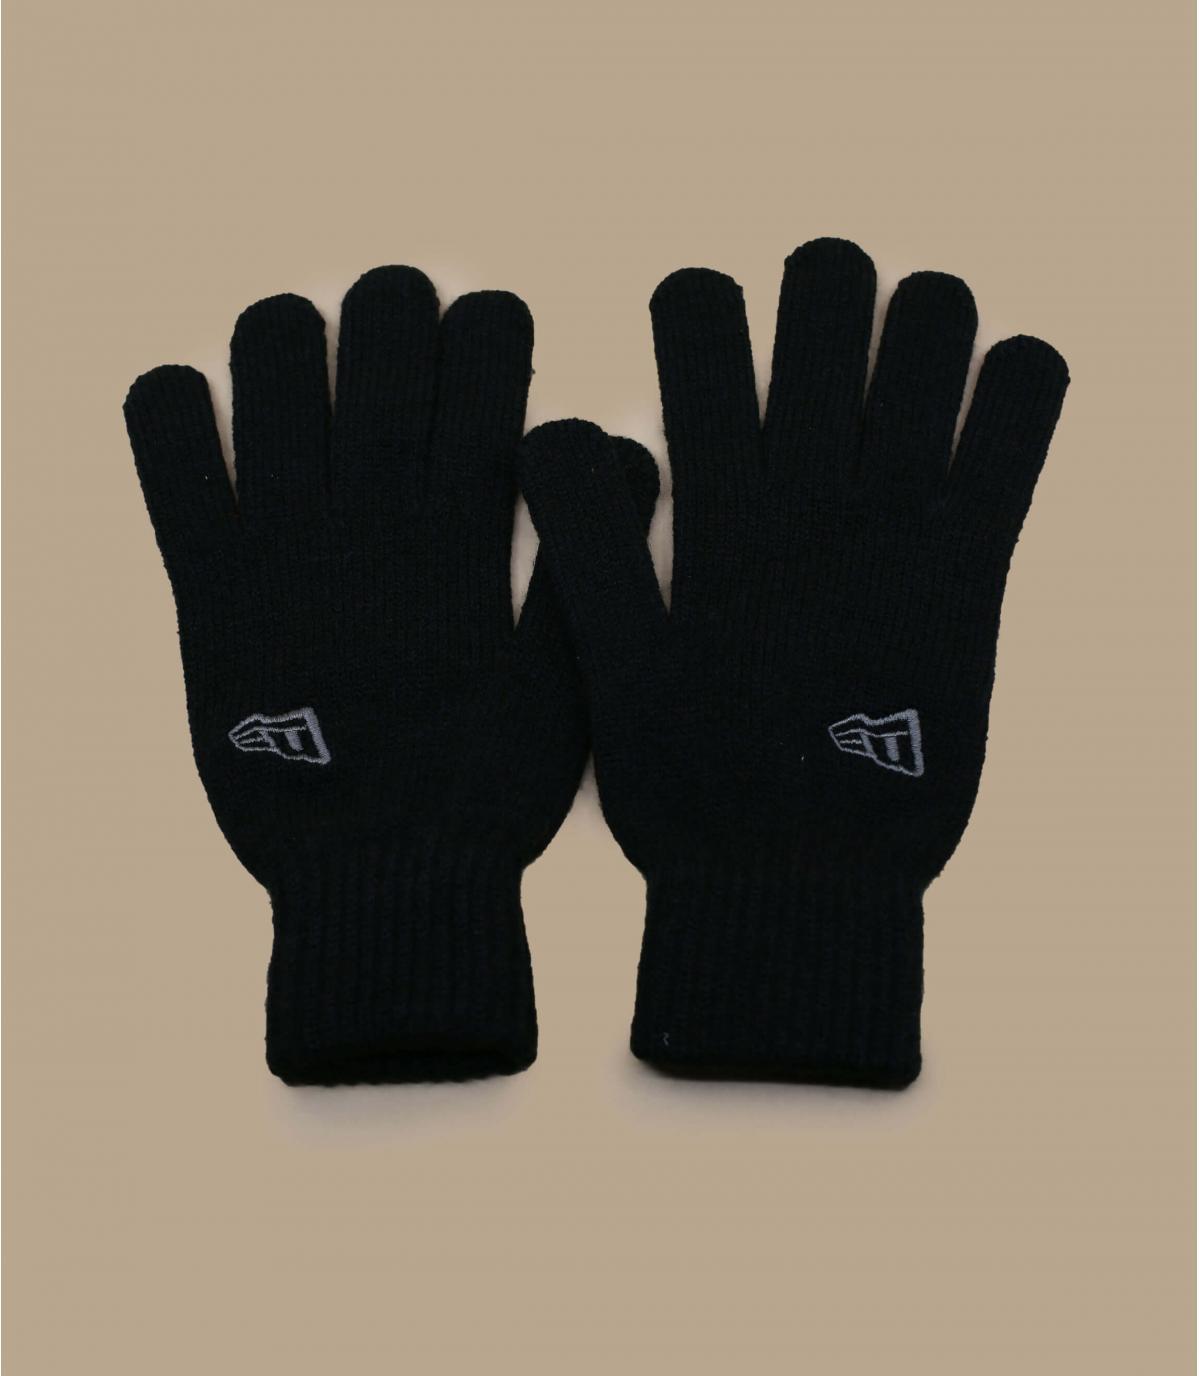 black New Era gloves